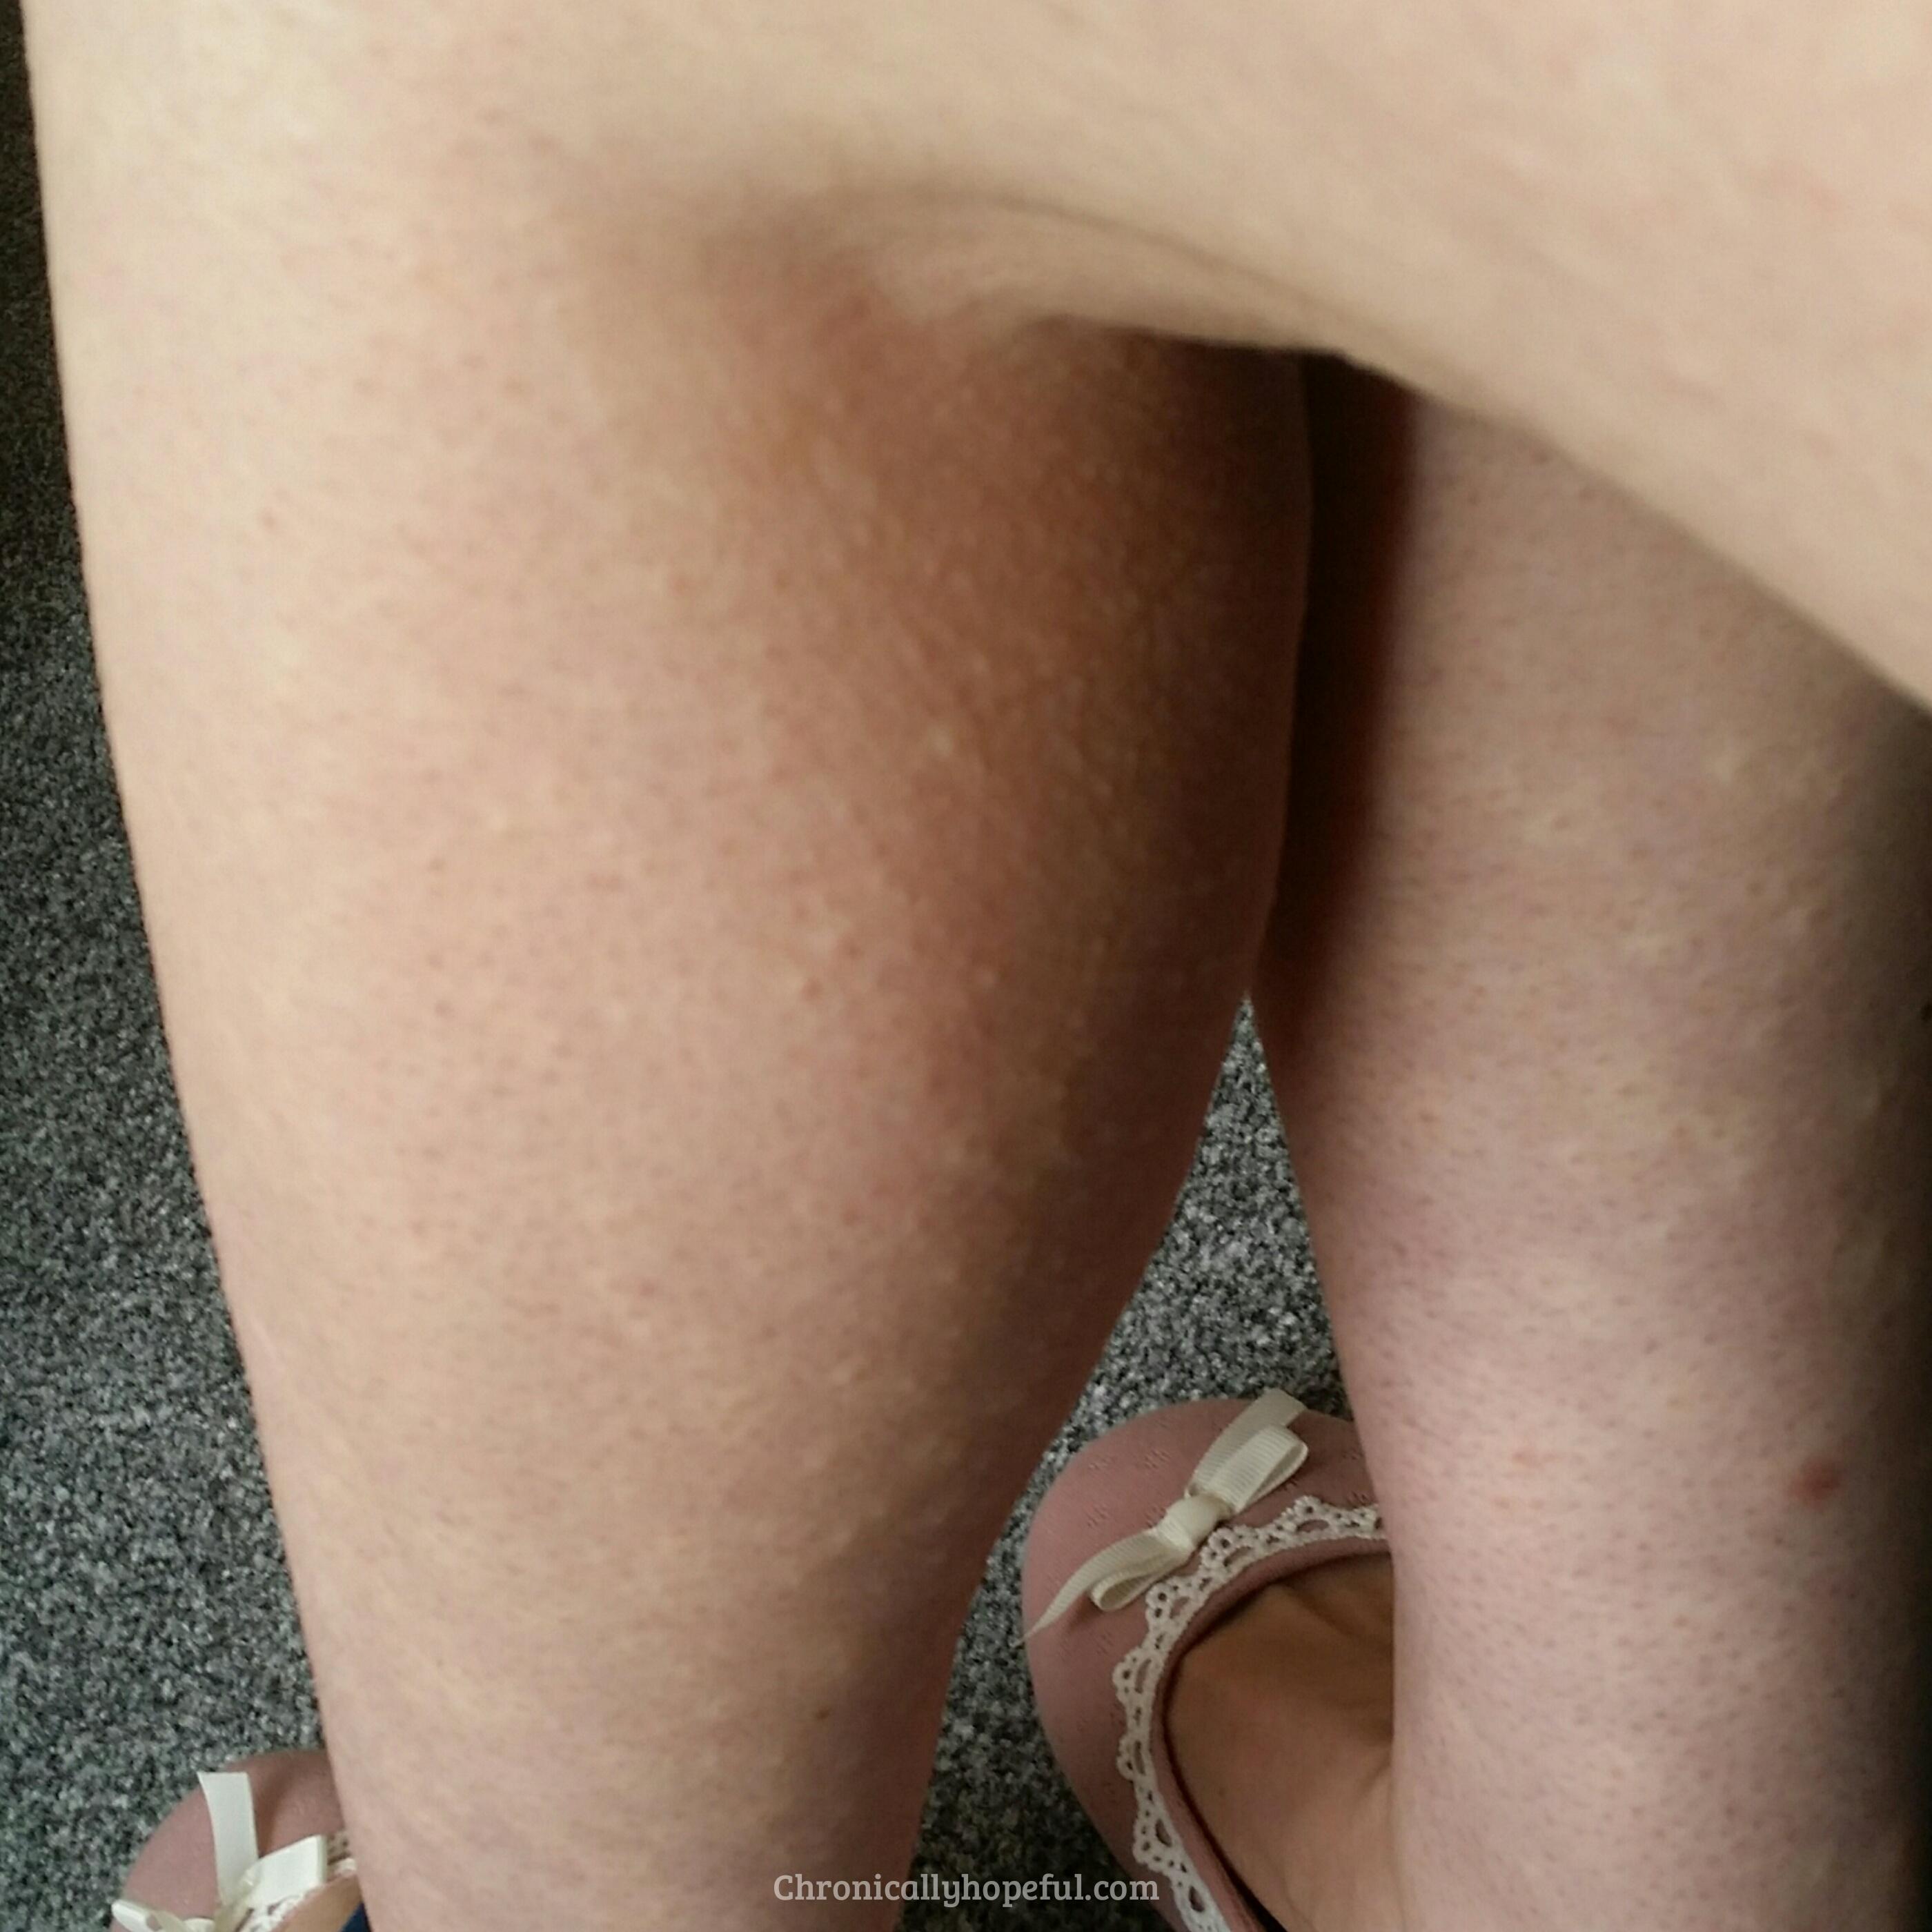 Daily Hives On Legs, Histamine Intolerance, Chronically Hopeful